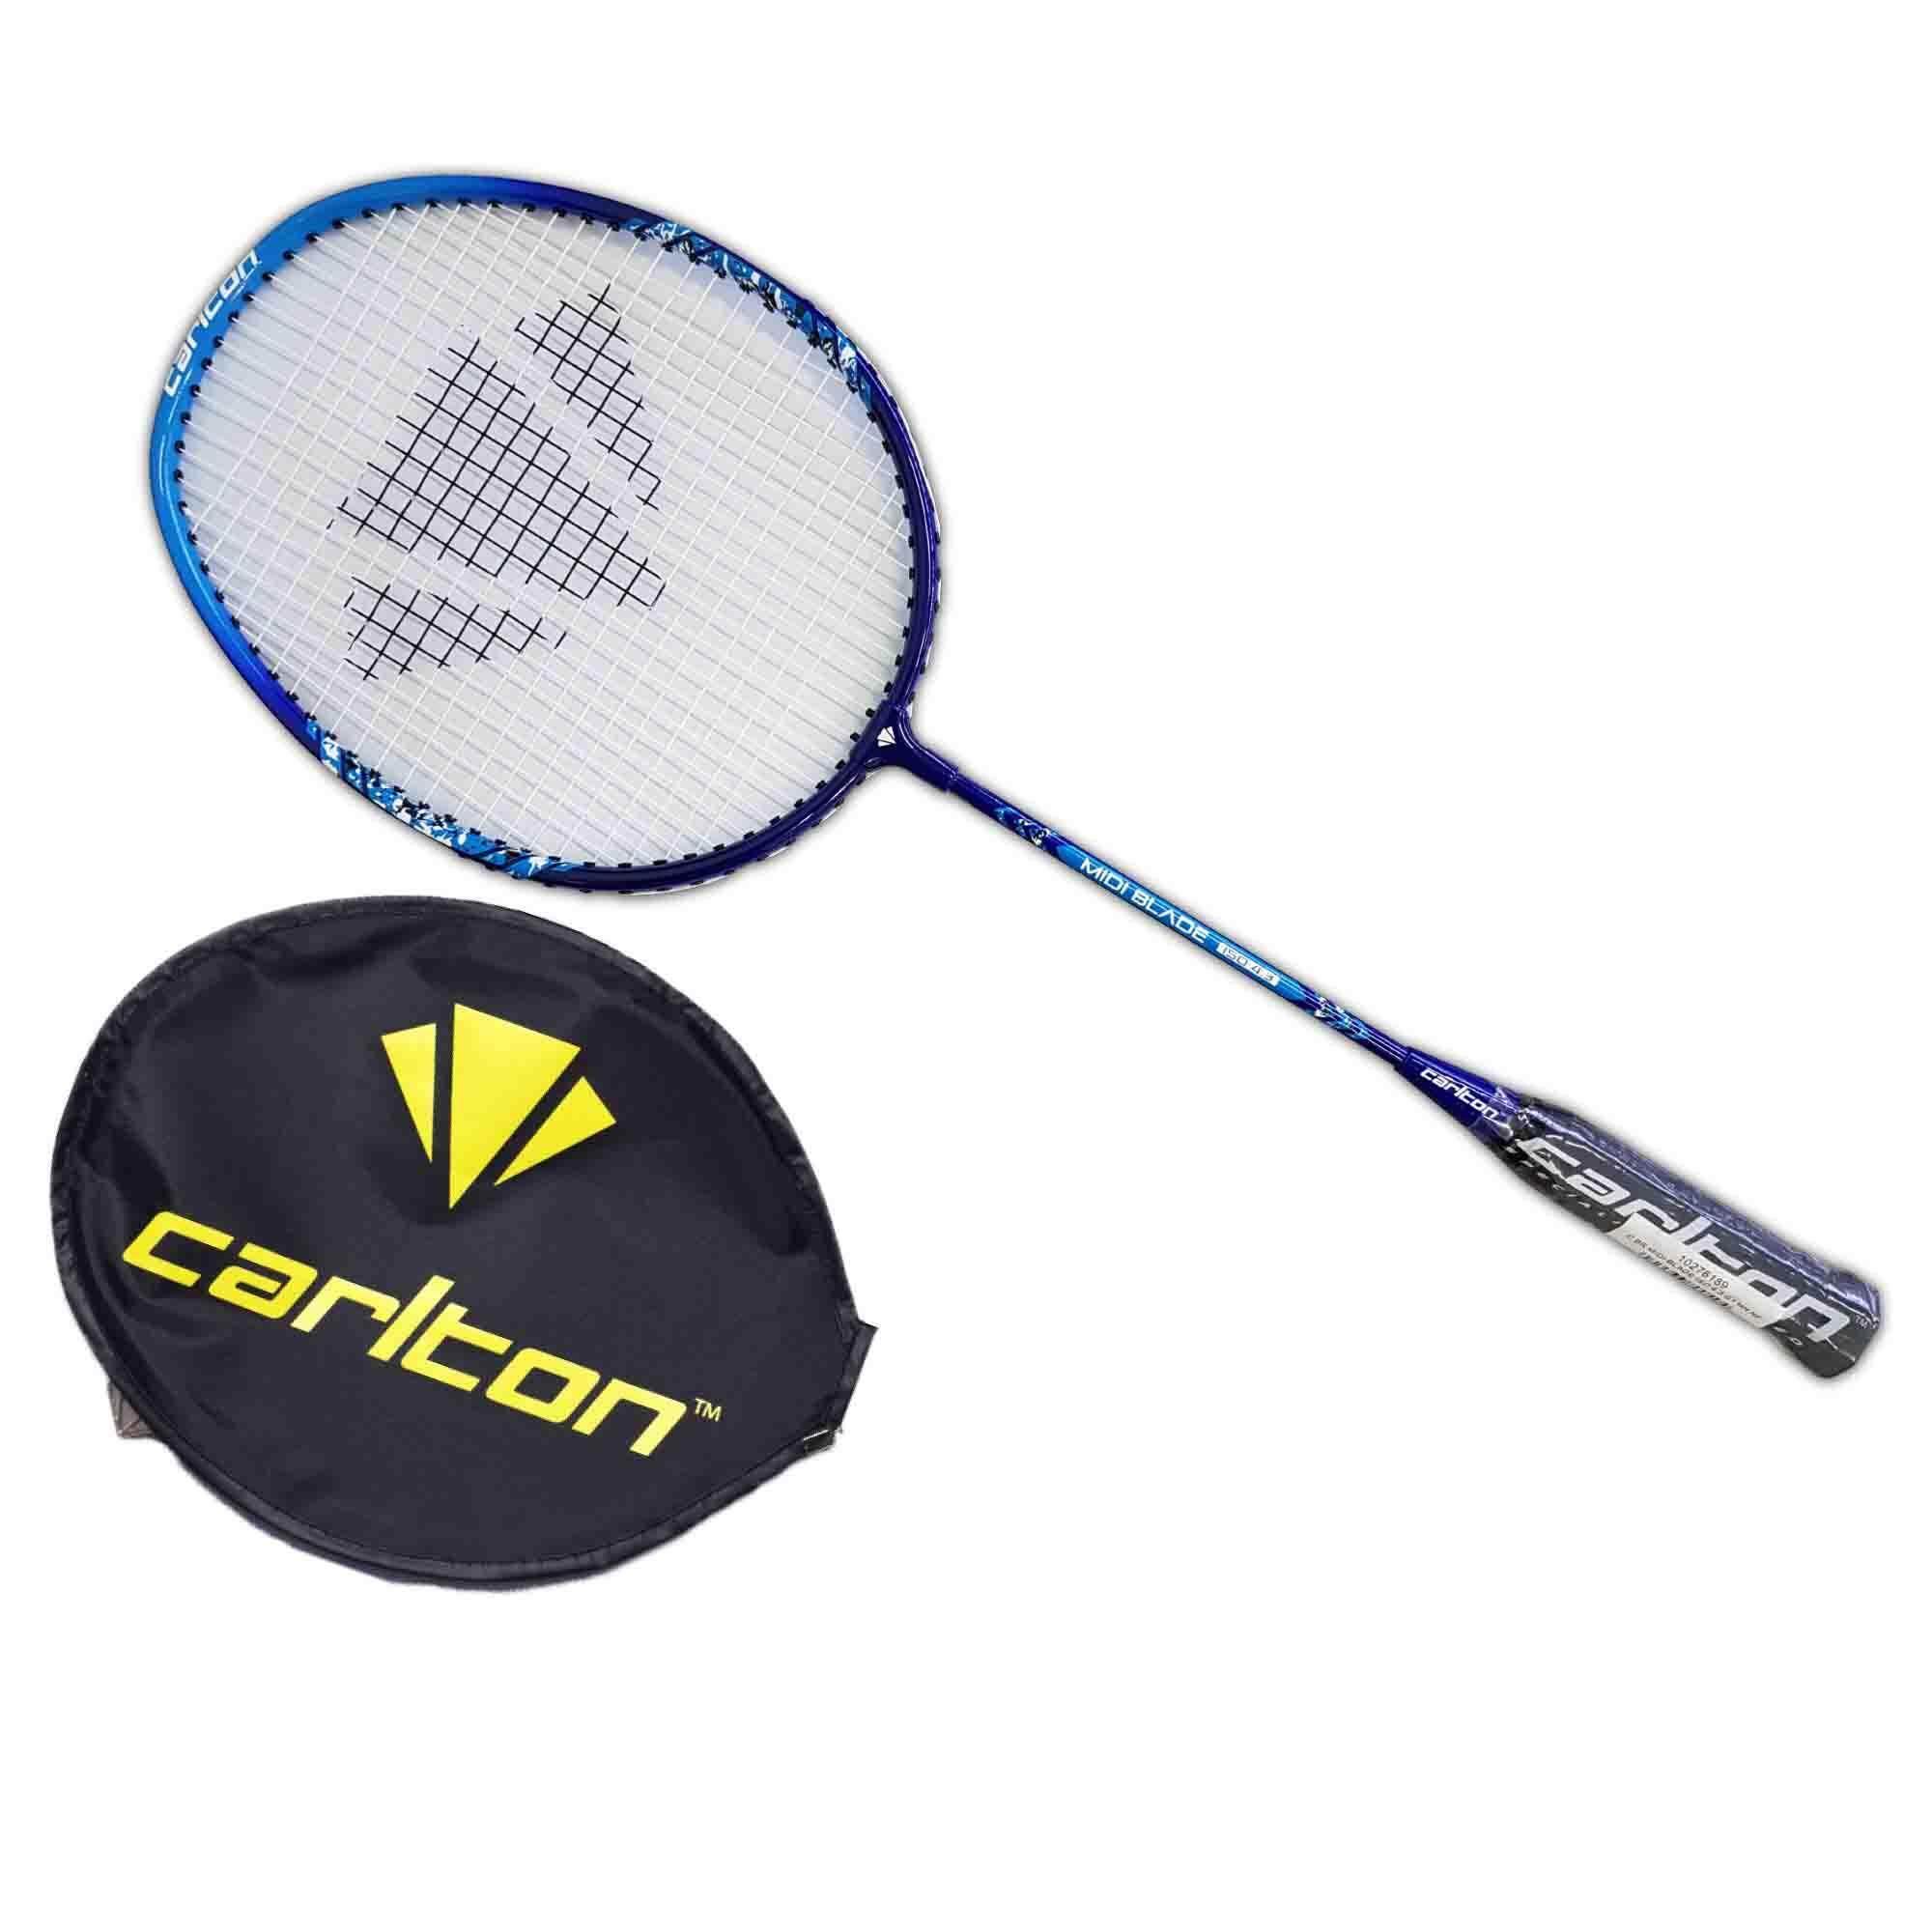 Carlton Badminton Racket Midi Blade Iso 4.3 For Kid